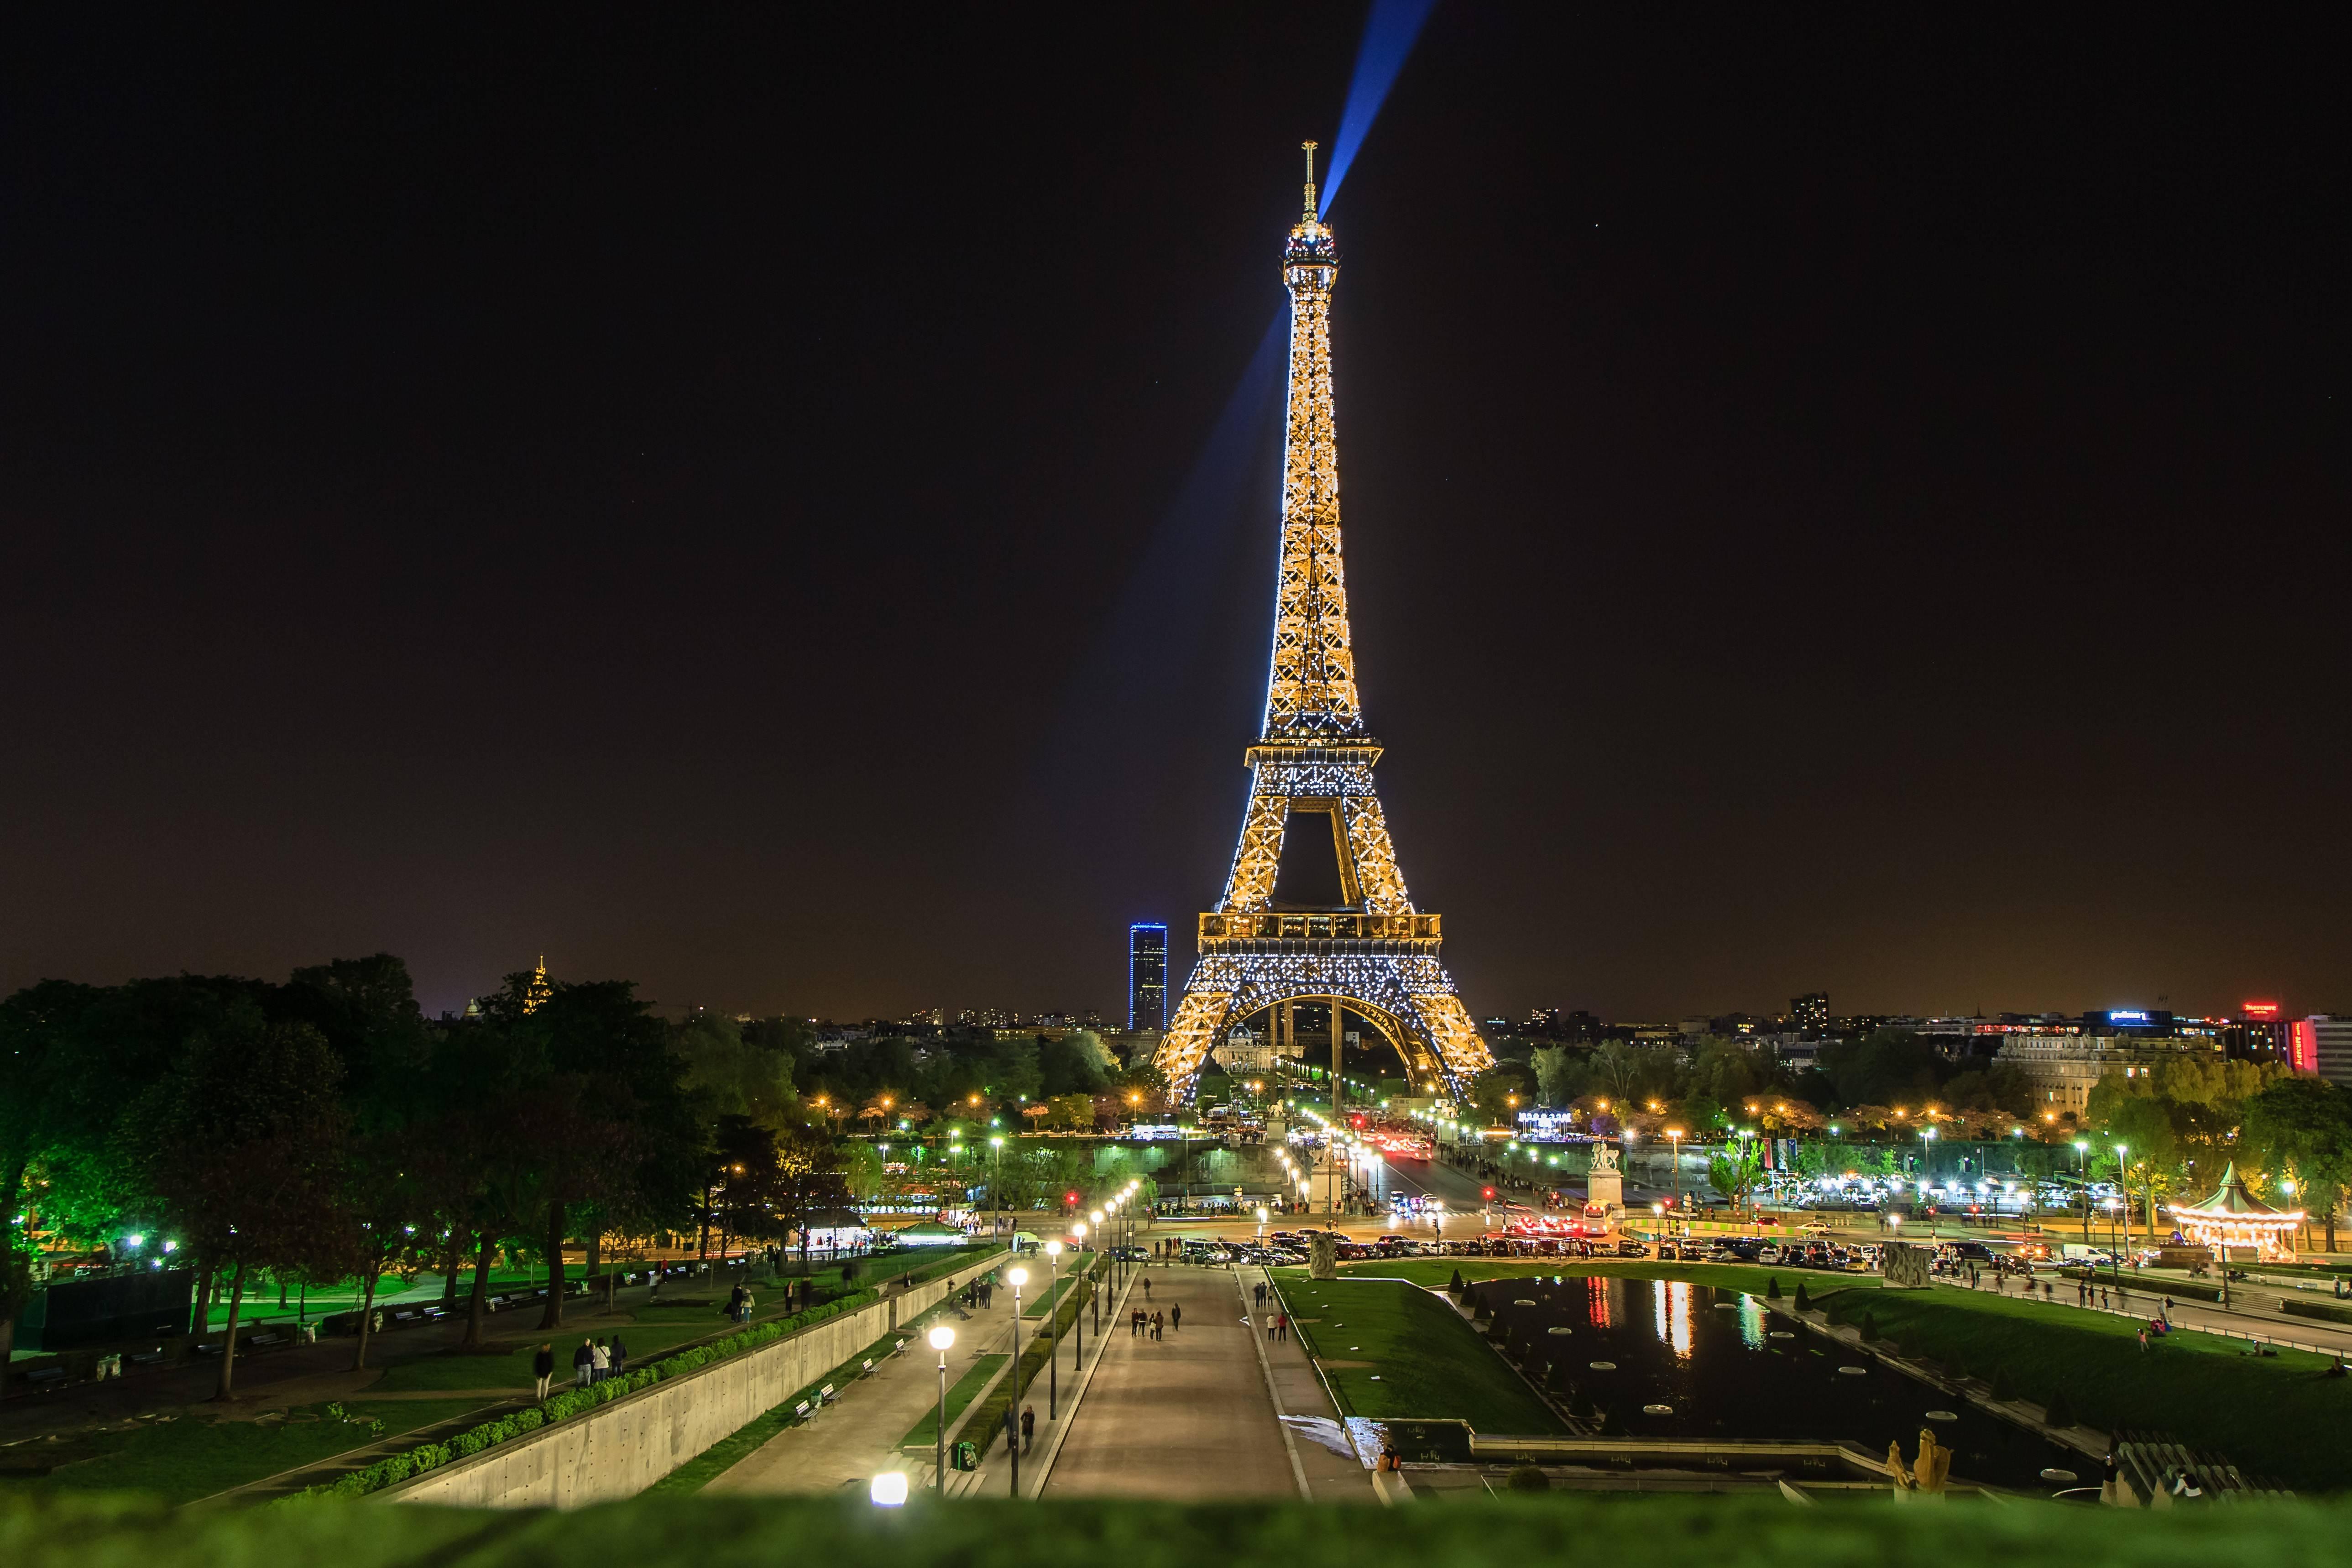 _Eiffel Tower at Night, Paris, France бесплатно